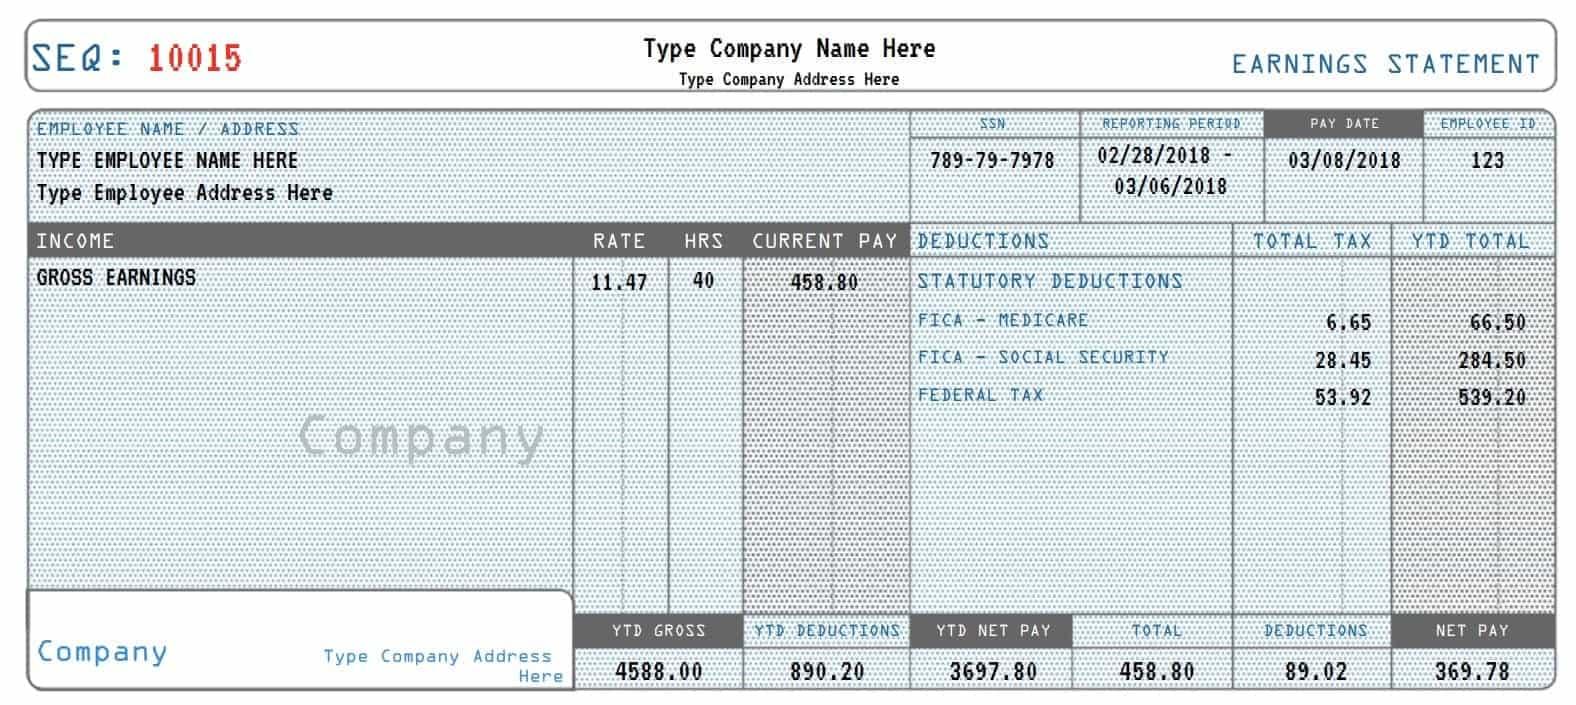 Real Paycheck Stubs | Create Stub